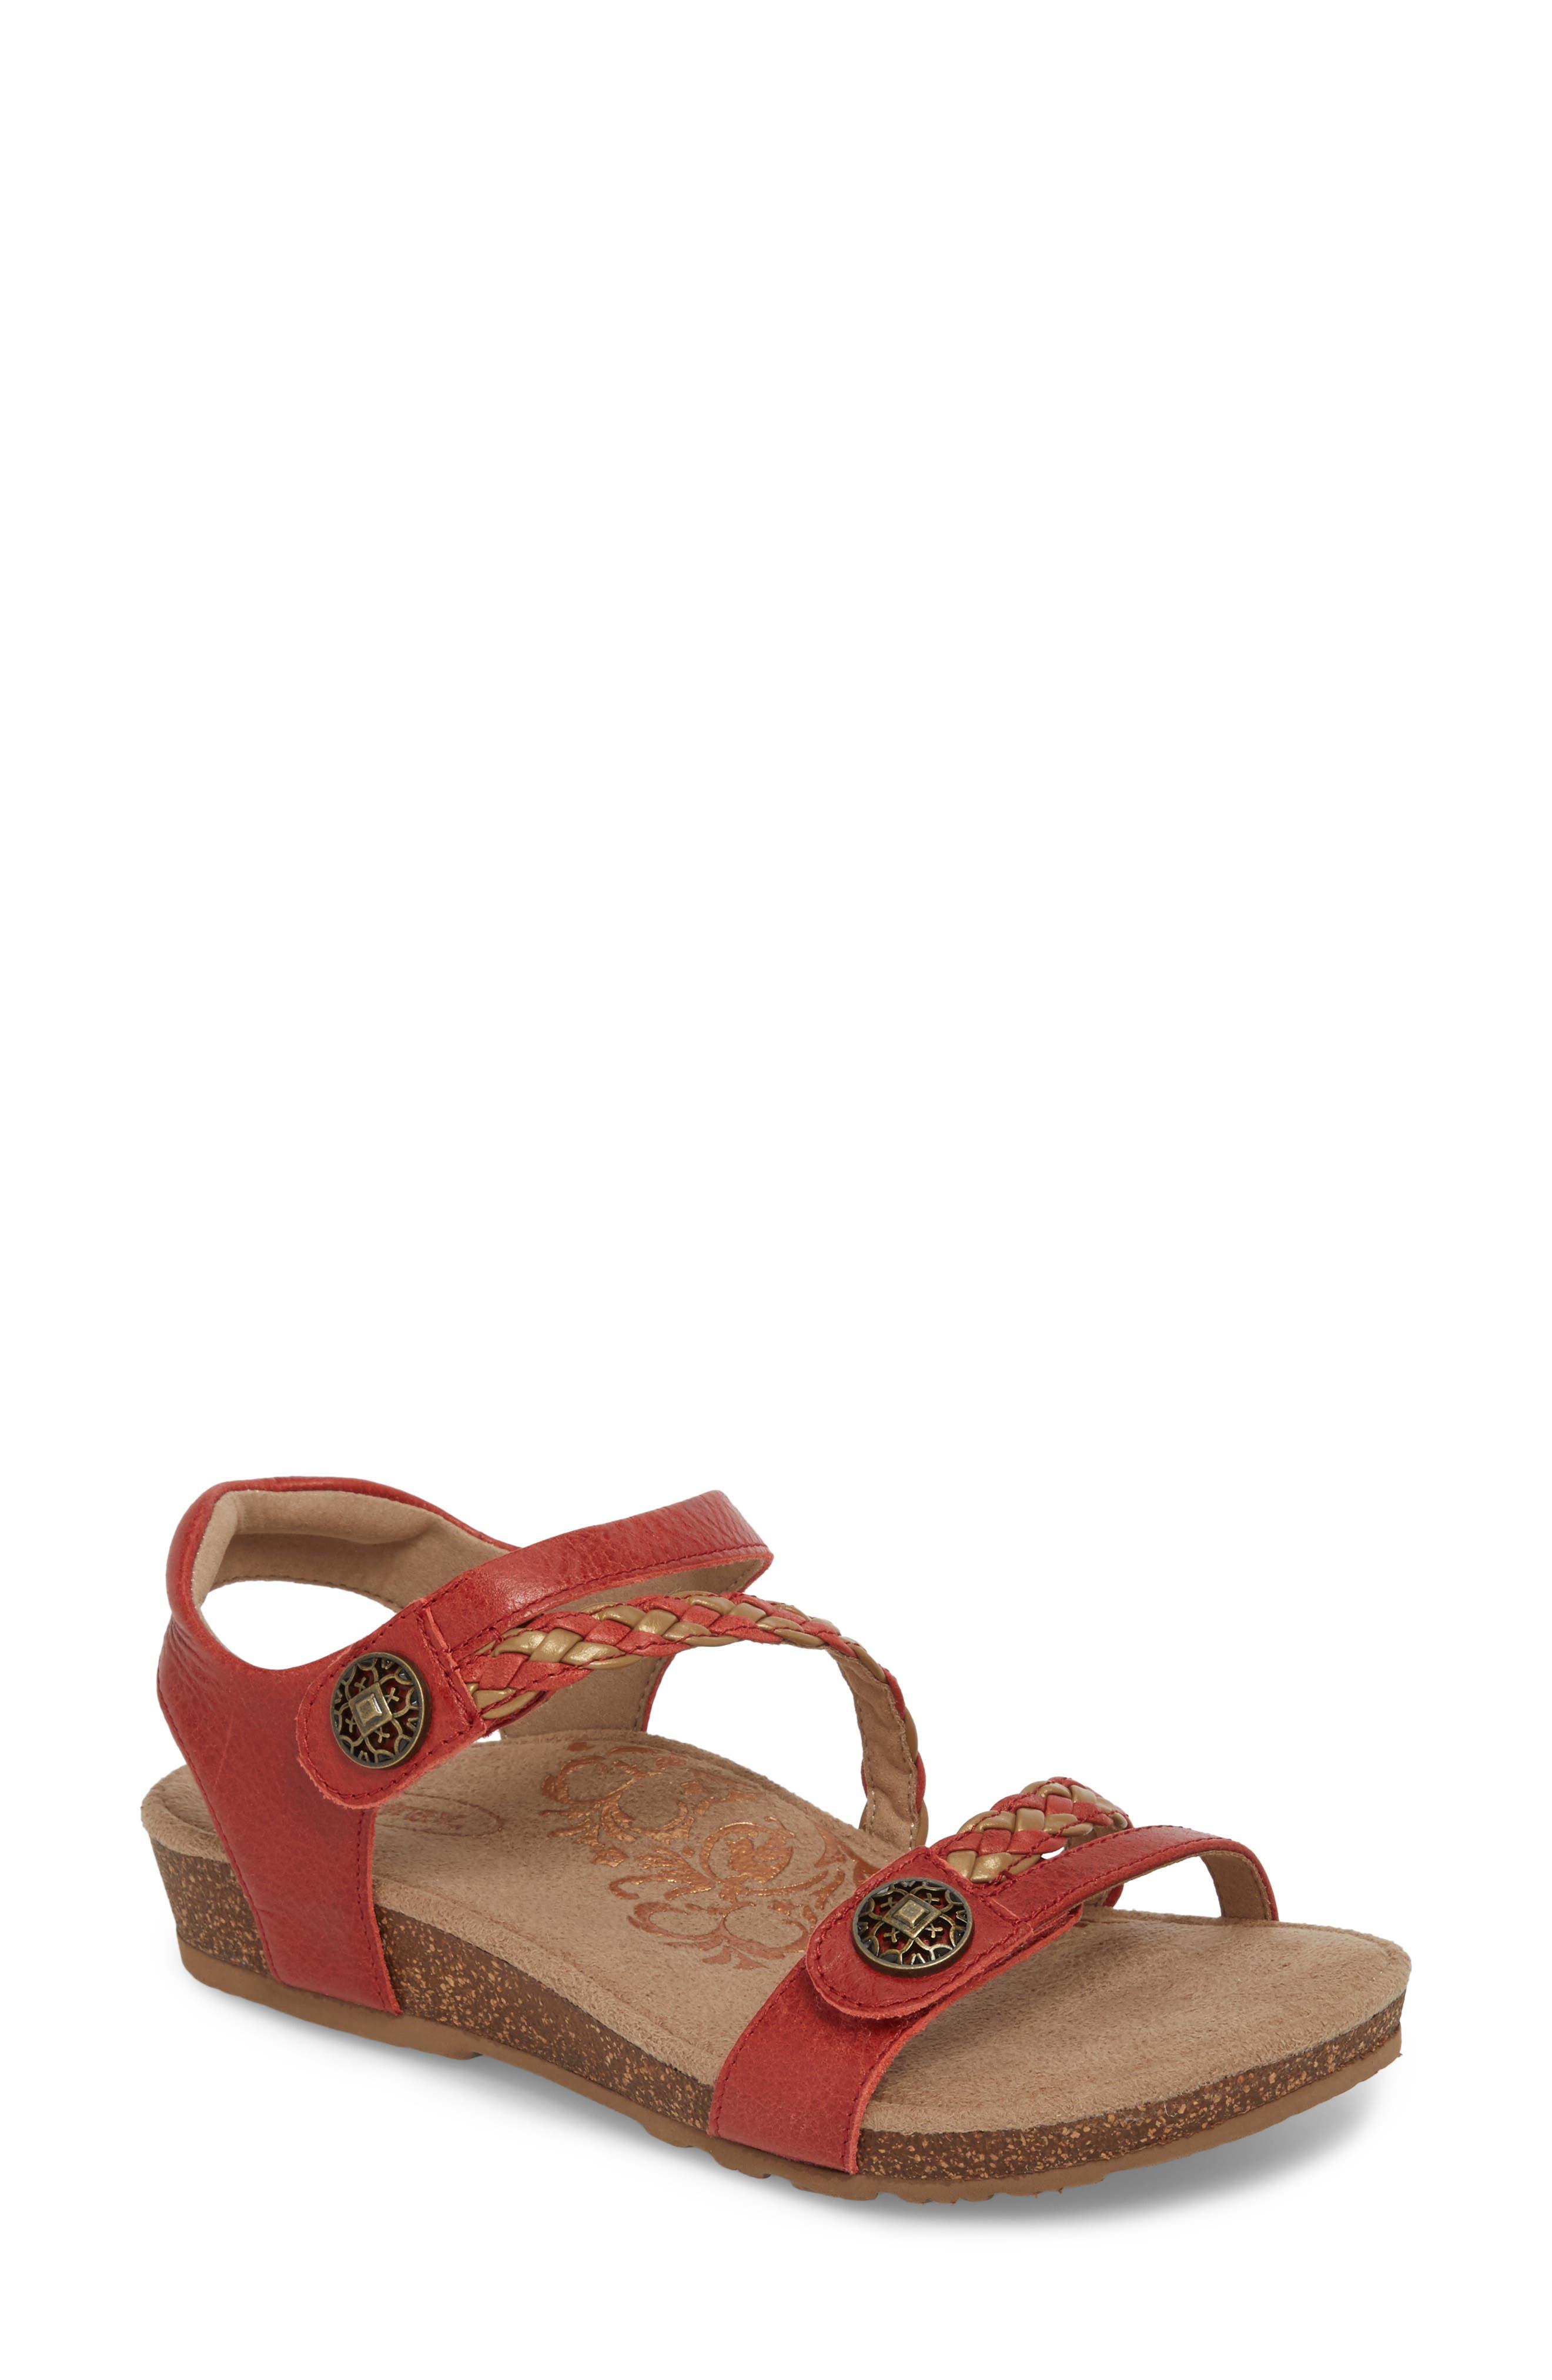 Aetrex 'Jillian' Braided Leather Strap Sandal ...